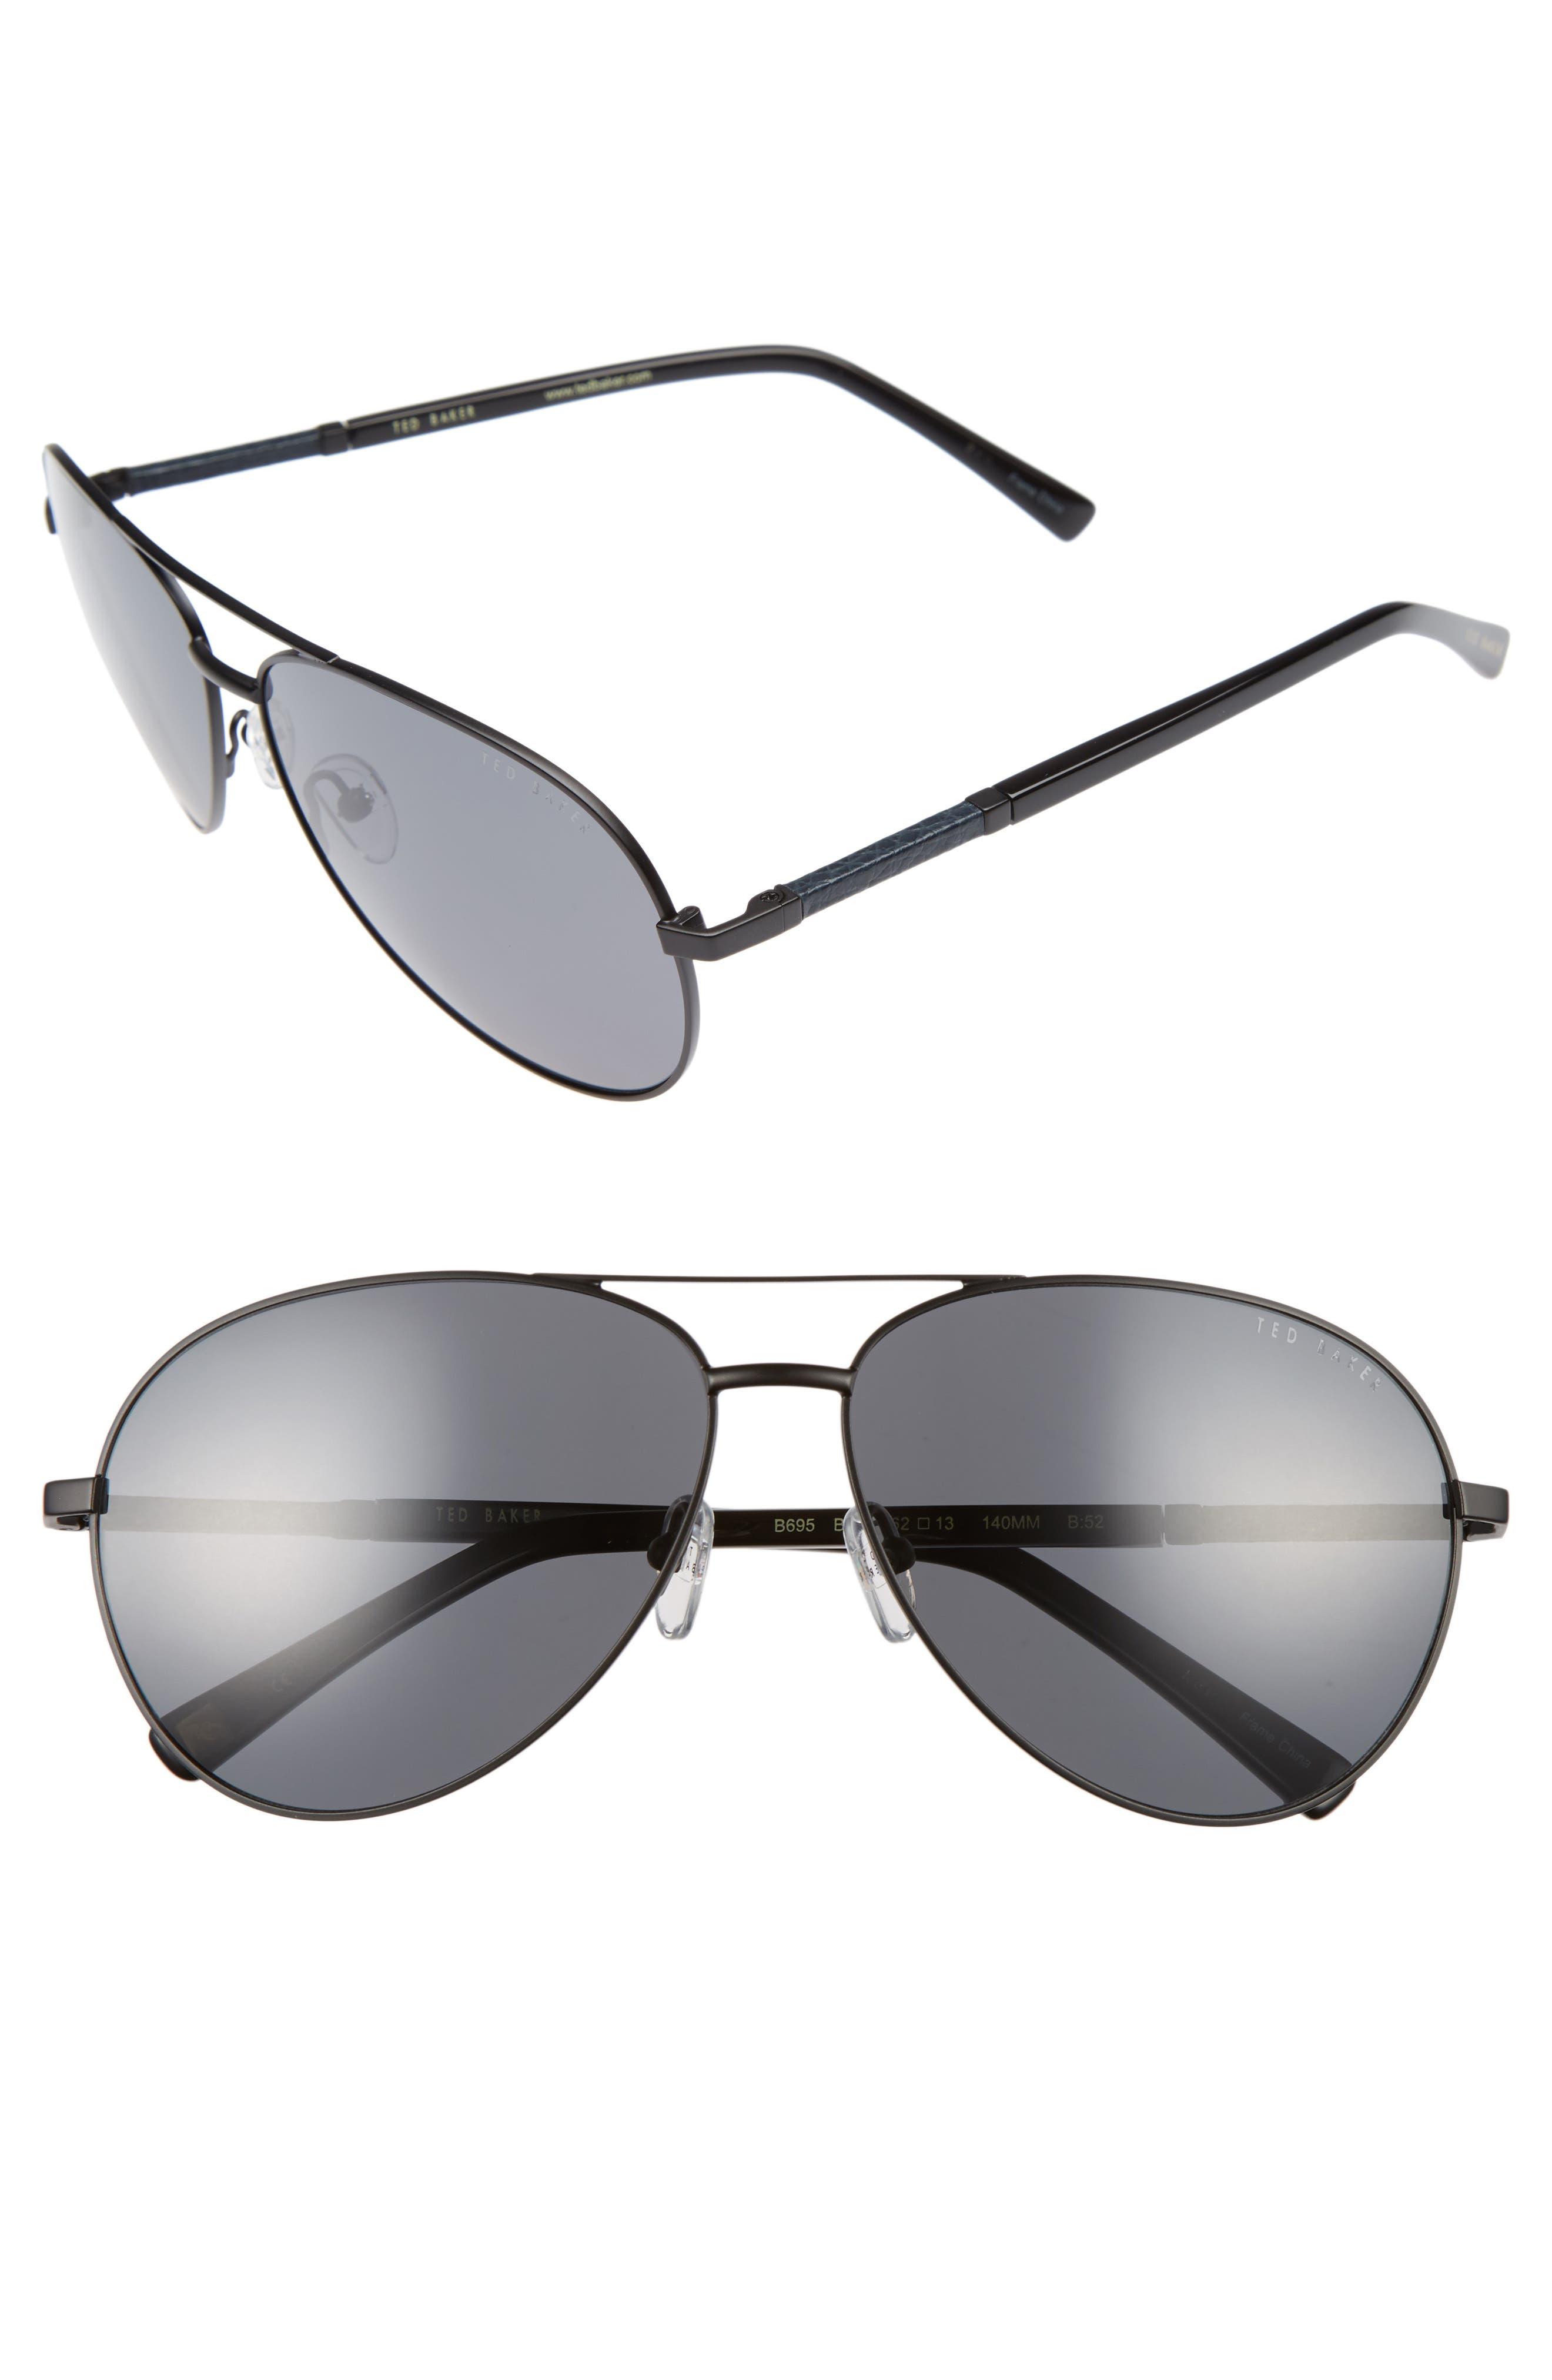 Main Image - Ted Baker London 62mm Polarized Aviator Sunglasses